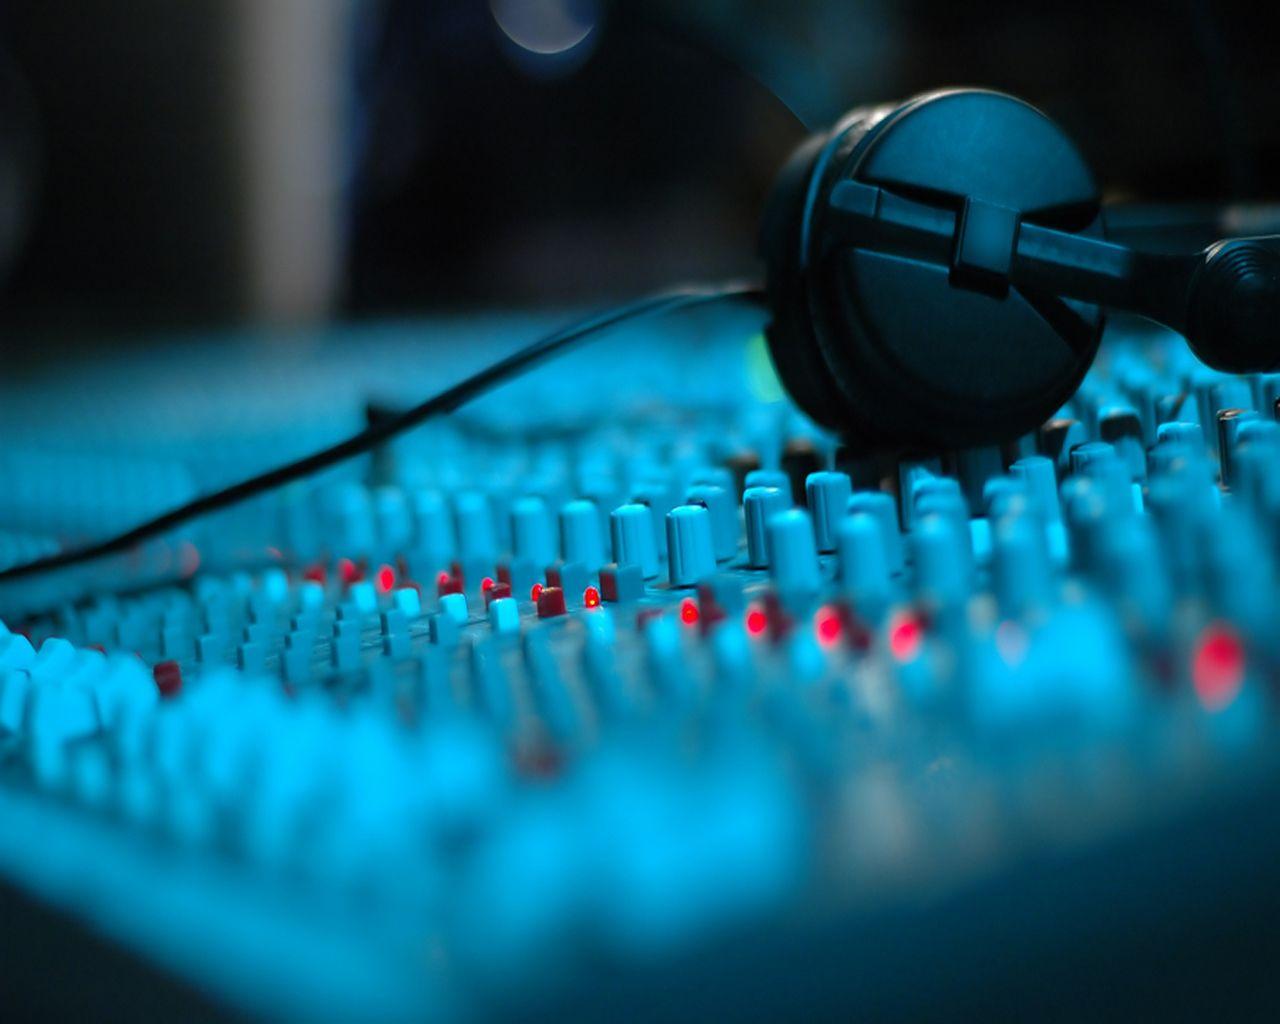 Arizona Music Studio Providing Tempe Audio Engineering Pro Tools And Productions